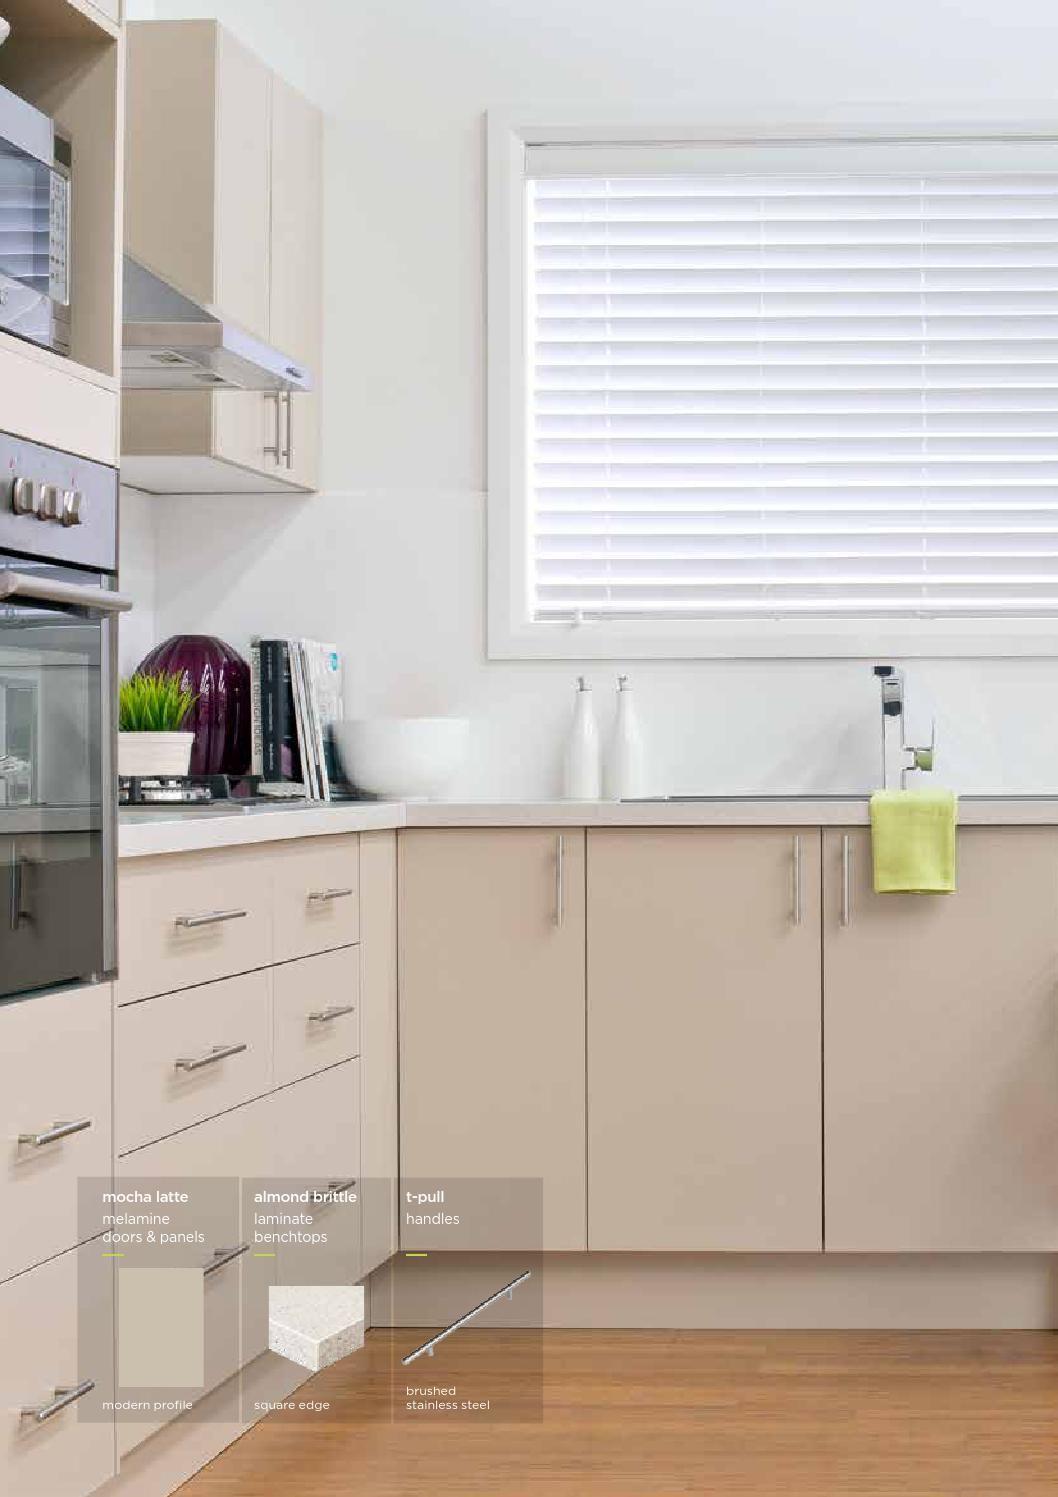 kaboodle kitchen australian catalogue kitchen kaboodle home decor on kaboodle kitchen layout id=53720